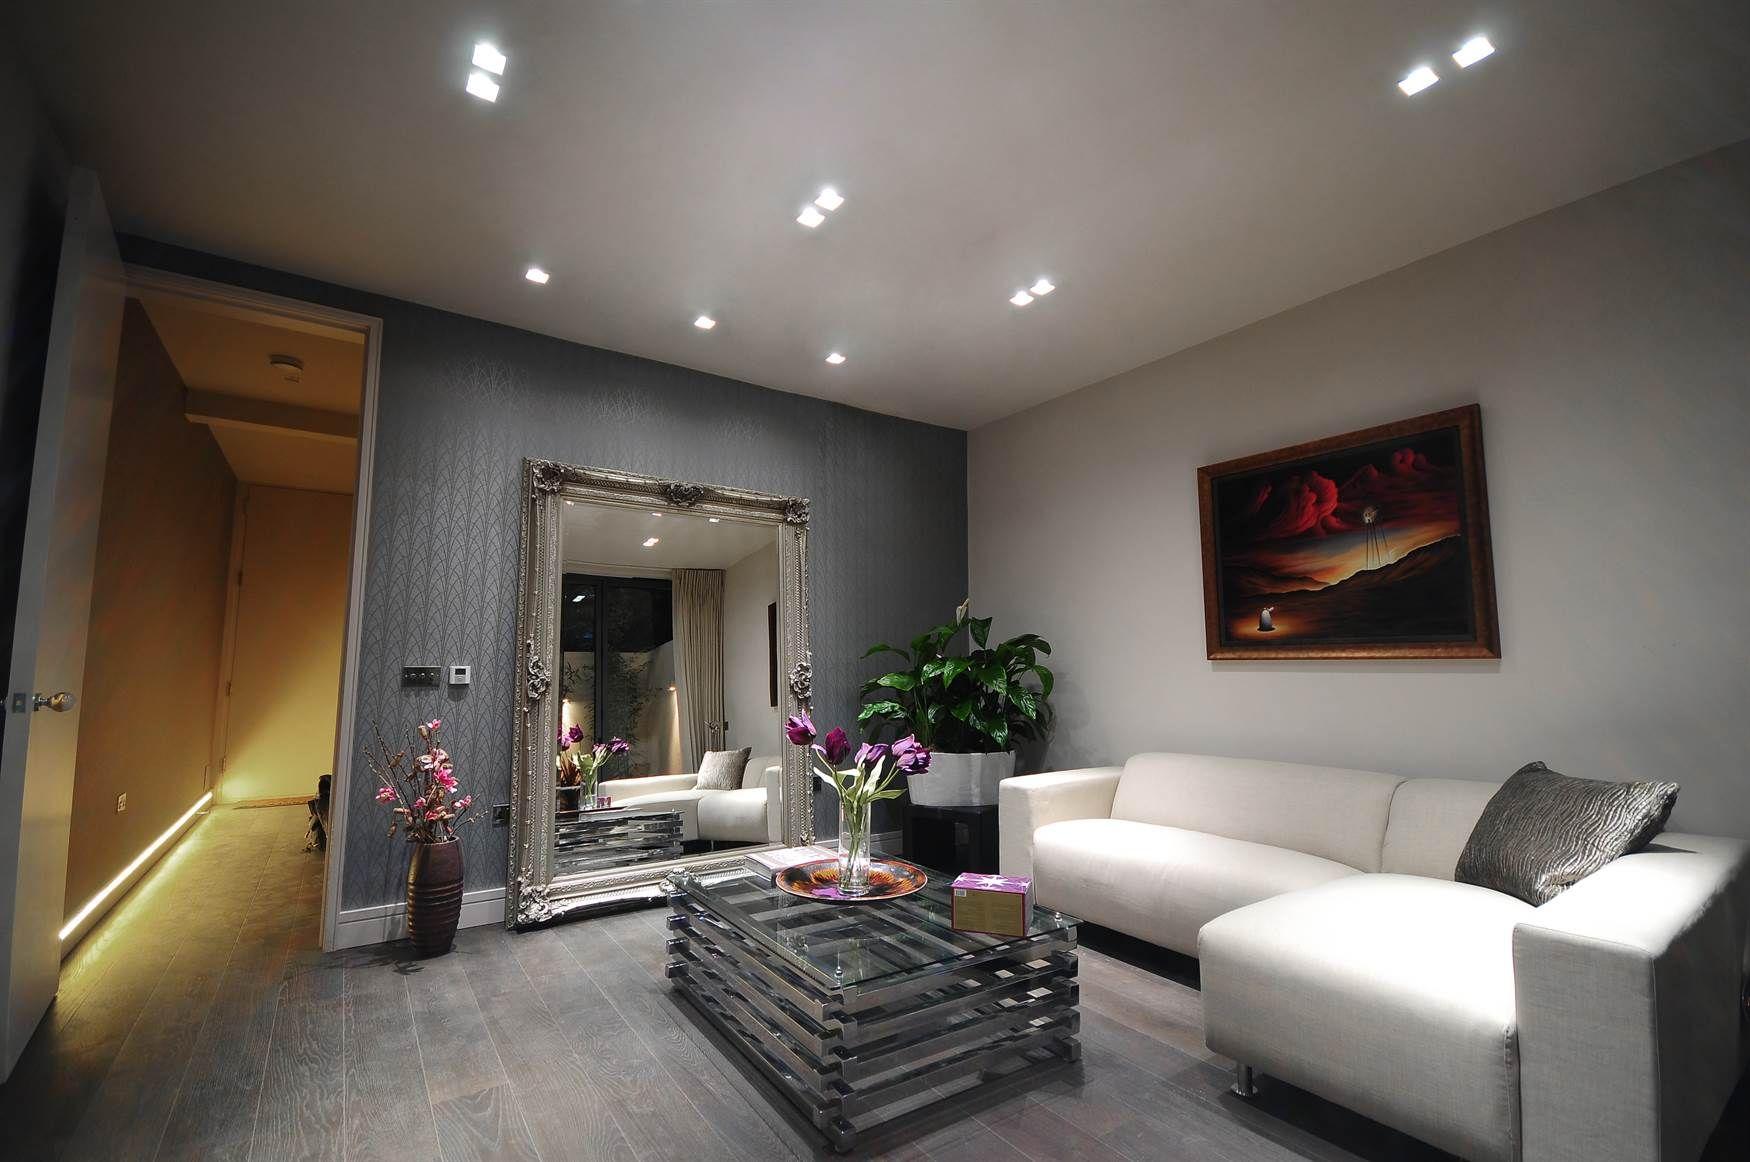 Living Room Lighting Design Mr Resistorshadow Gap With Led Tape Entrancing Living Room Lighting Decorating Inspiration